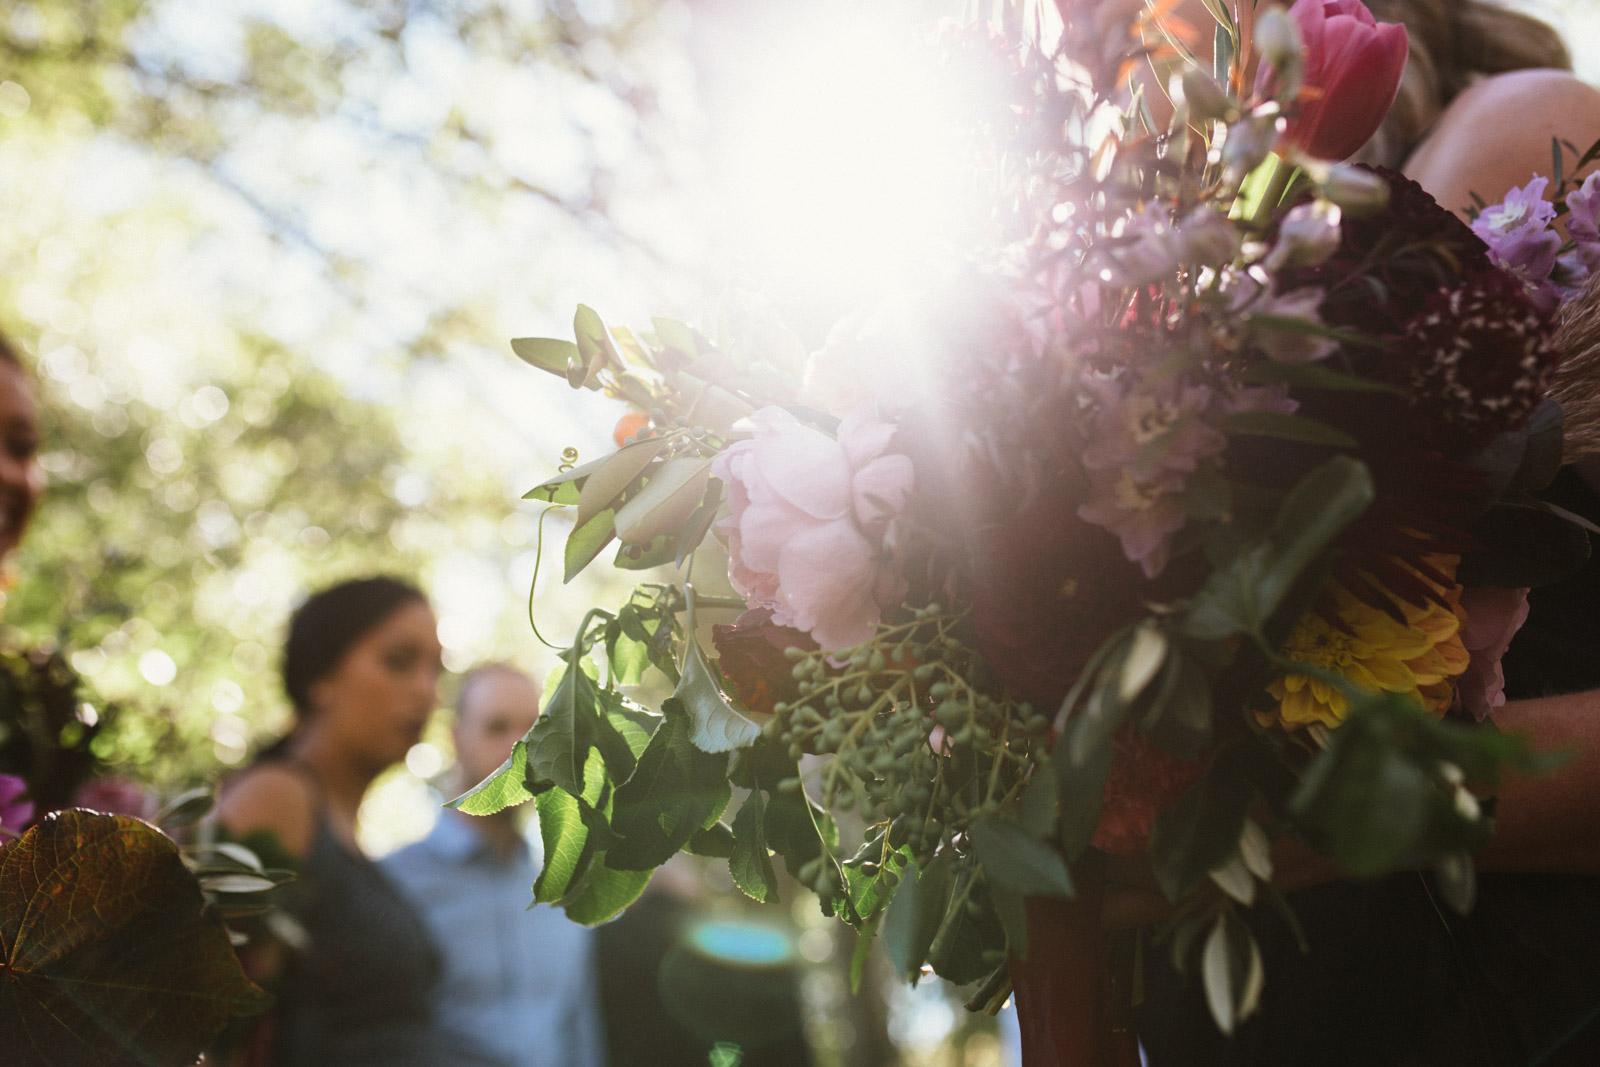 ZD-Melbourne Wedding Photographer-Dean Raphael-55.jpg